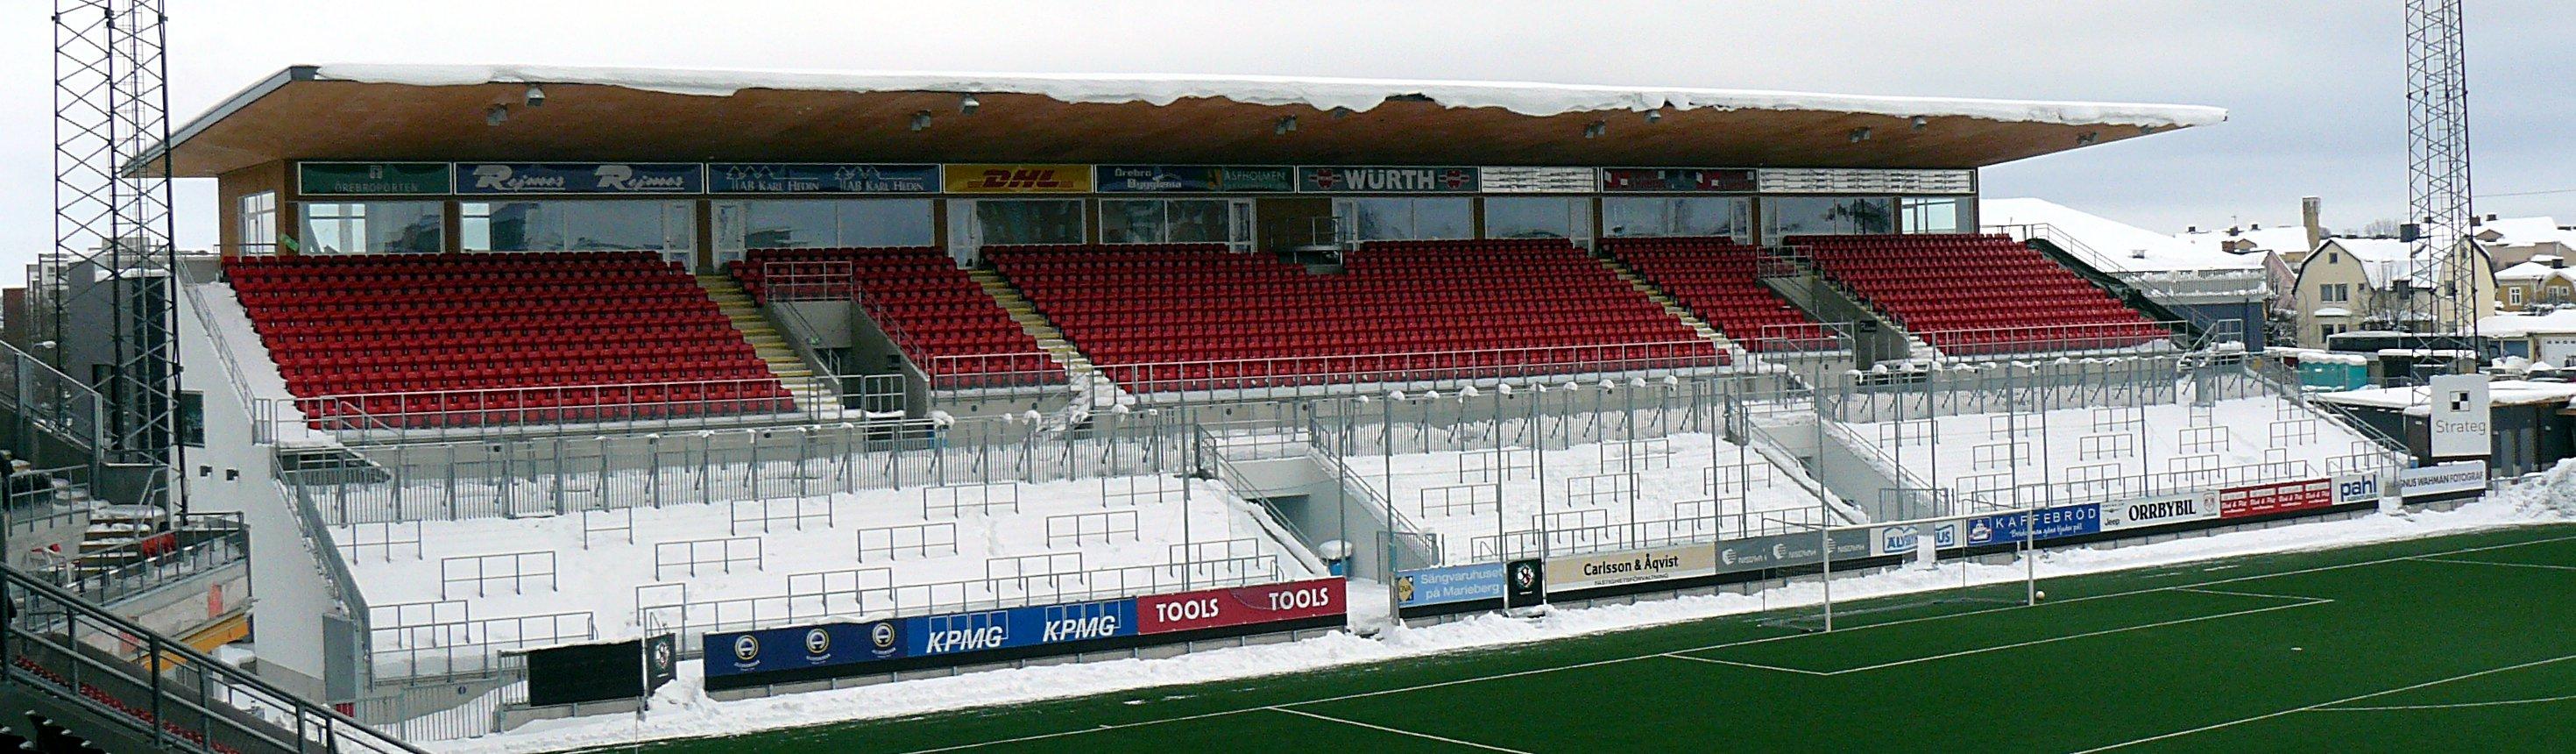 Behrn Arena #